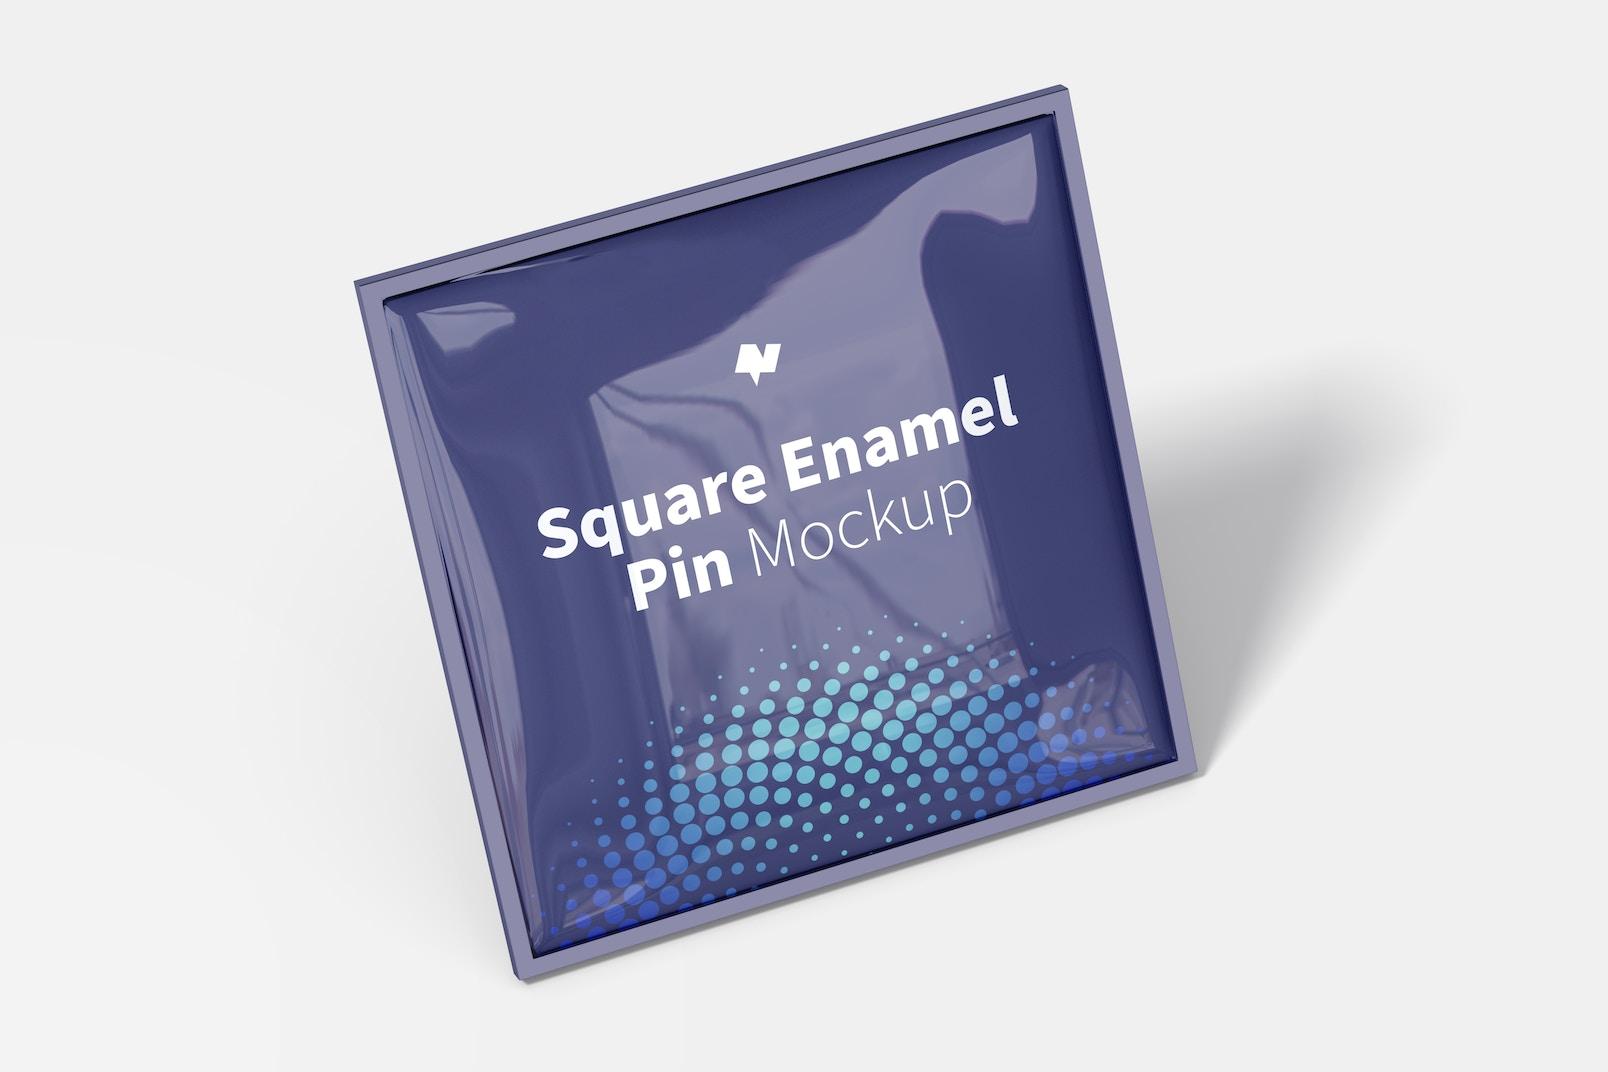 Square Enamel Pin Mockup